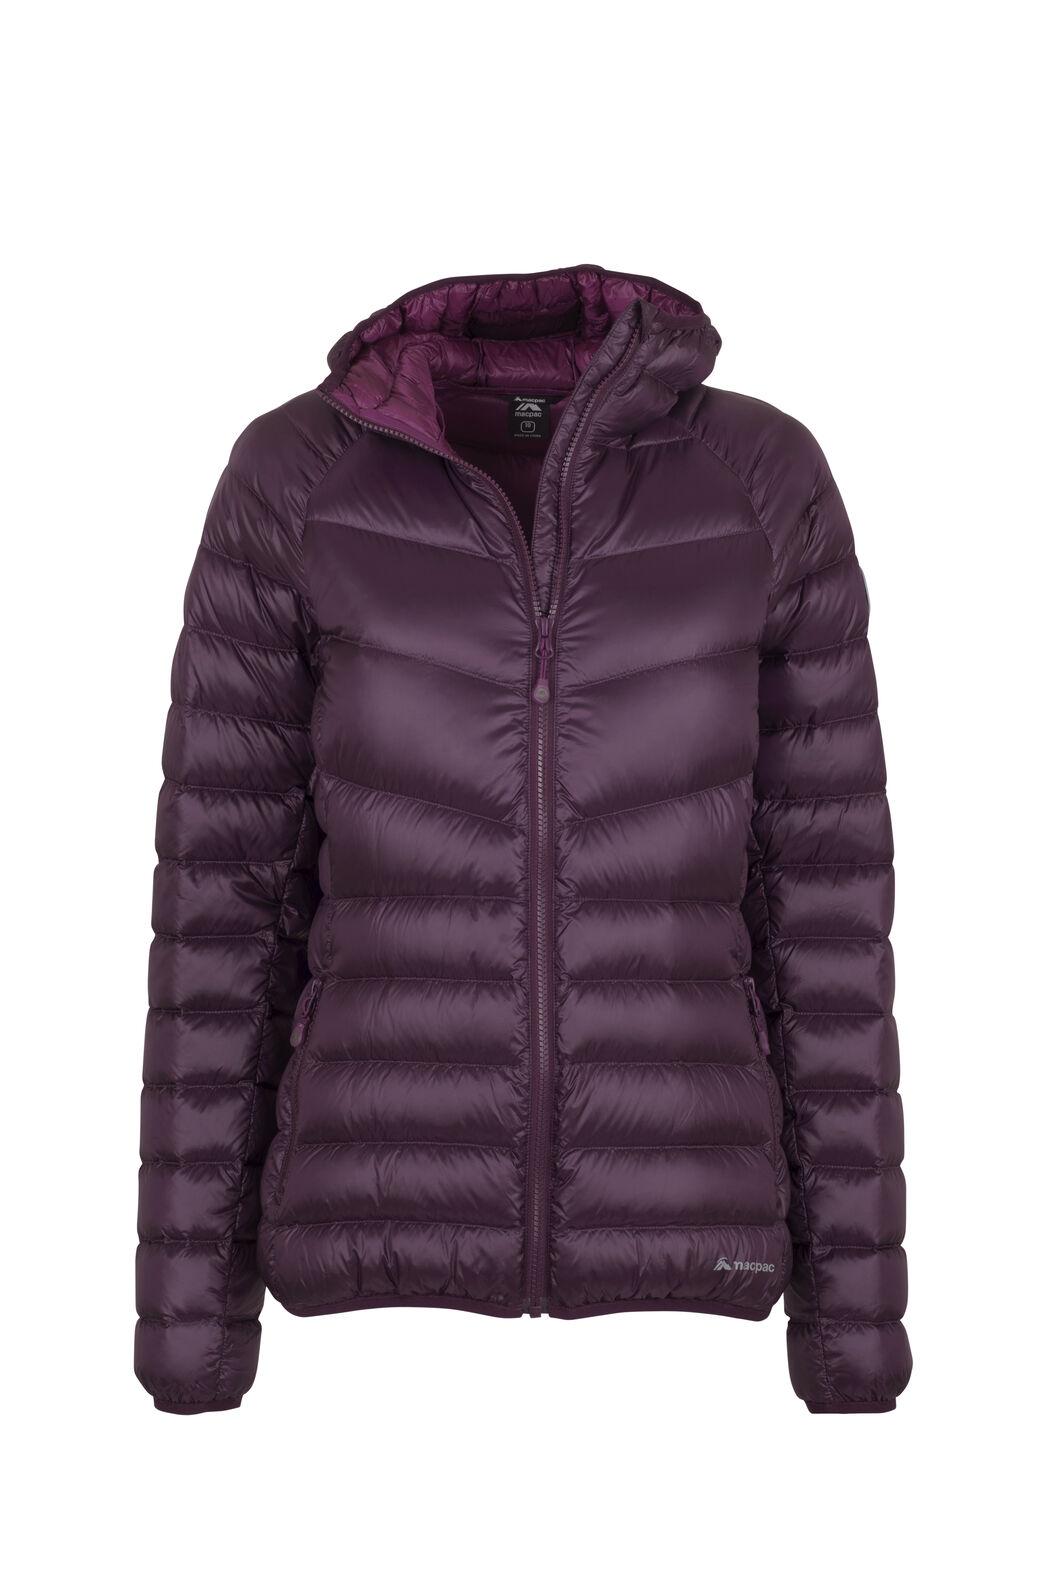 Macpac Mercury Down Jacket - Women's, Potent Purple, hi-res